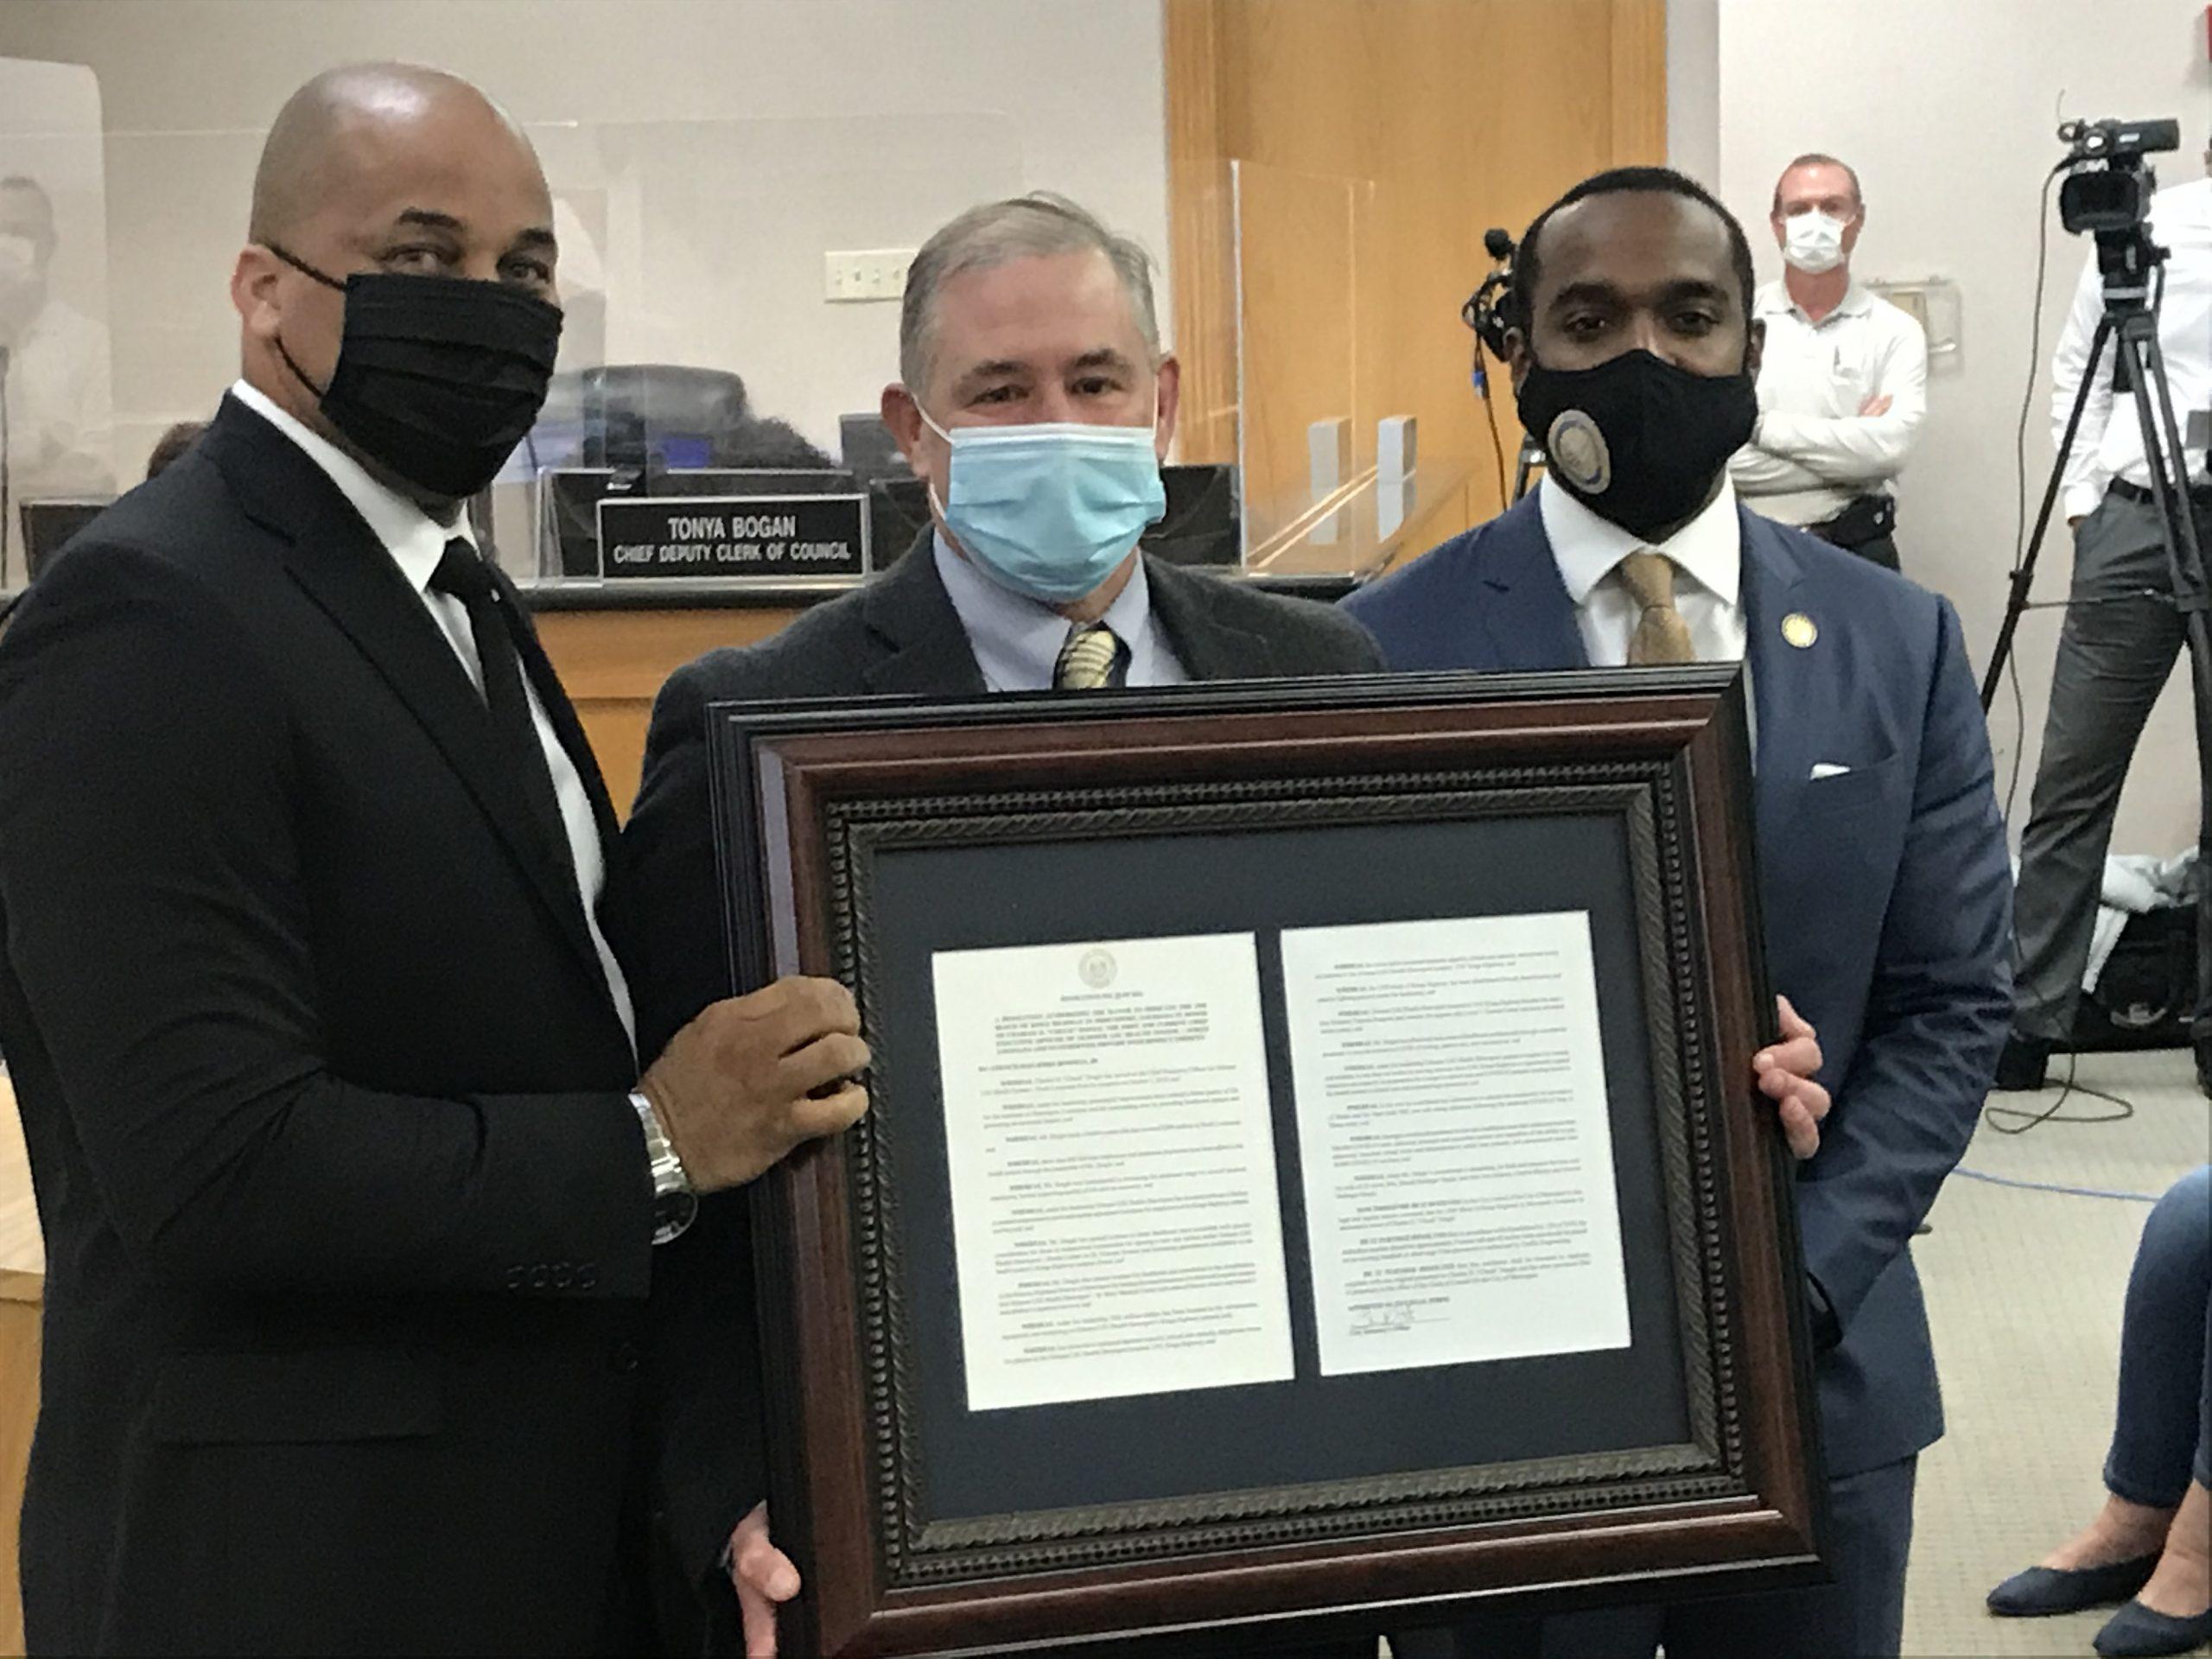 Chuck Daigle Ochsner receives city council award alongside Bowman and Mayor Perkins